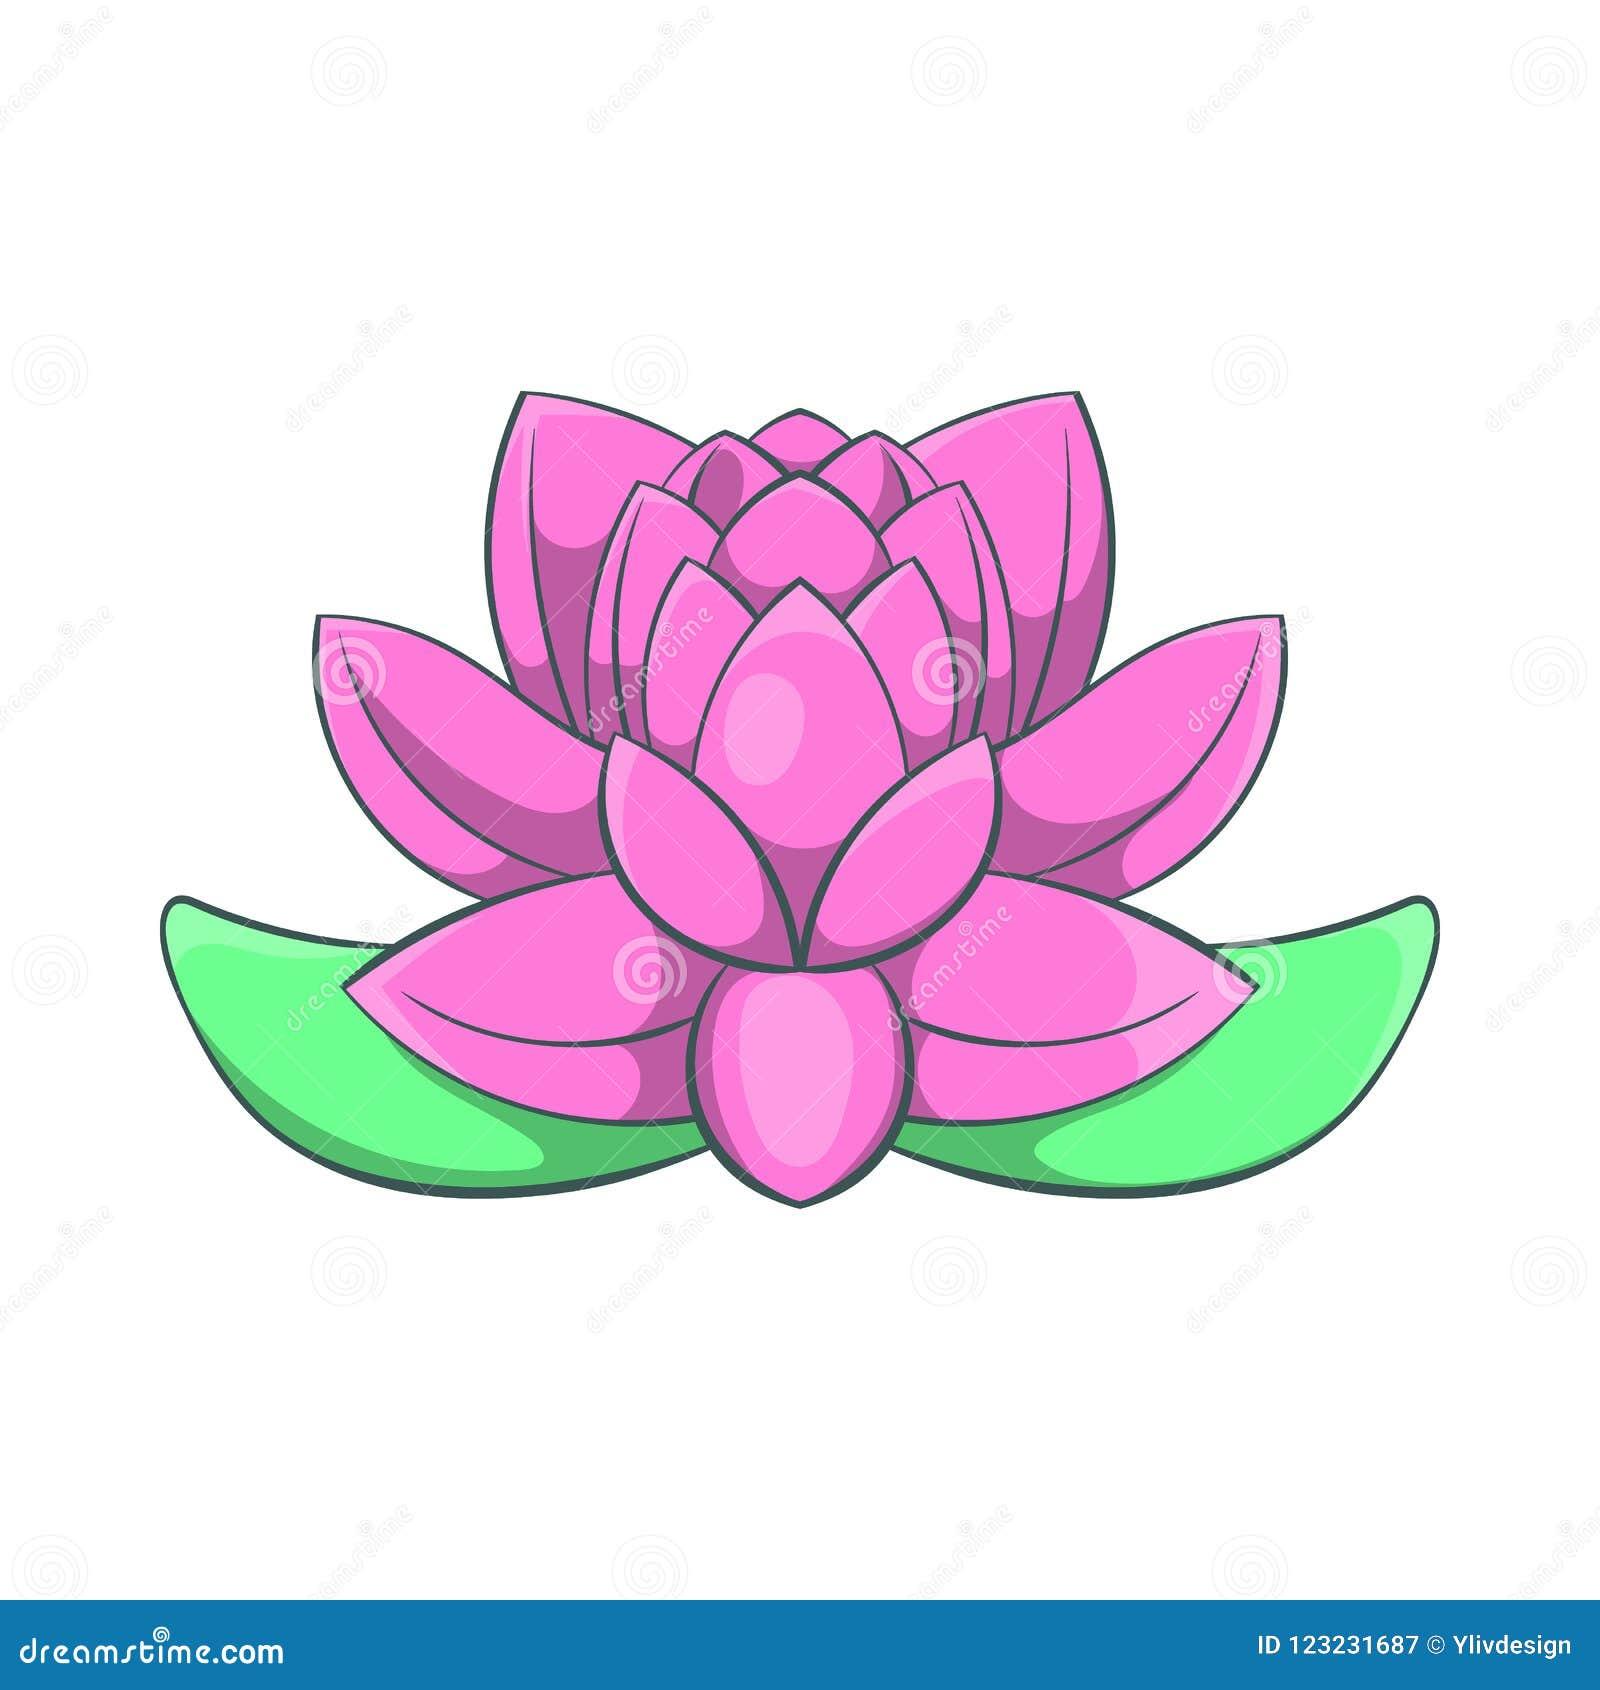 Pink lotus flower icon cartoon style stock illustration download pink lotus flower icon cartoon style stock illustration illustration of natural floral mightylinksfo